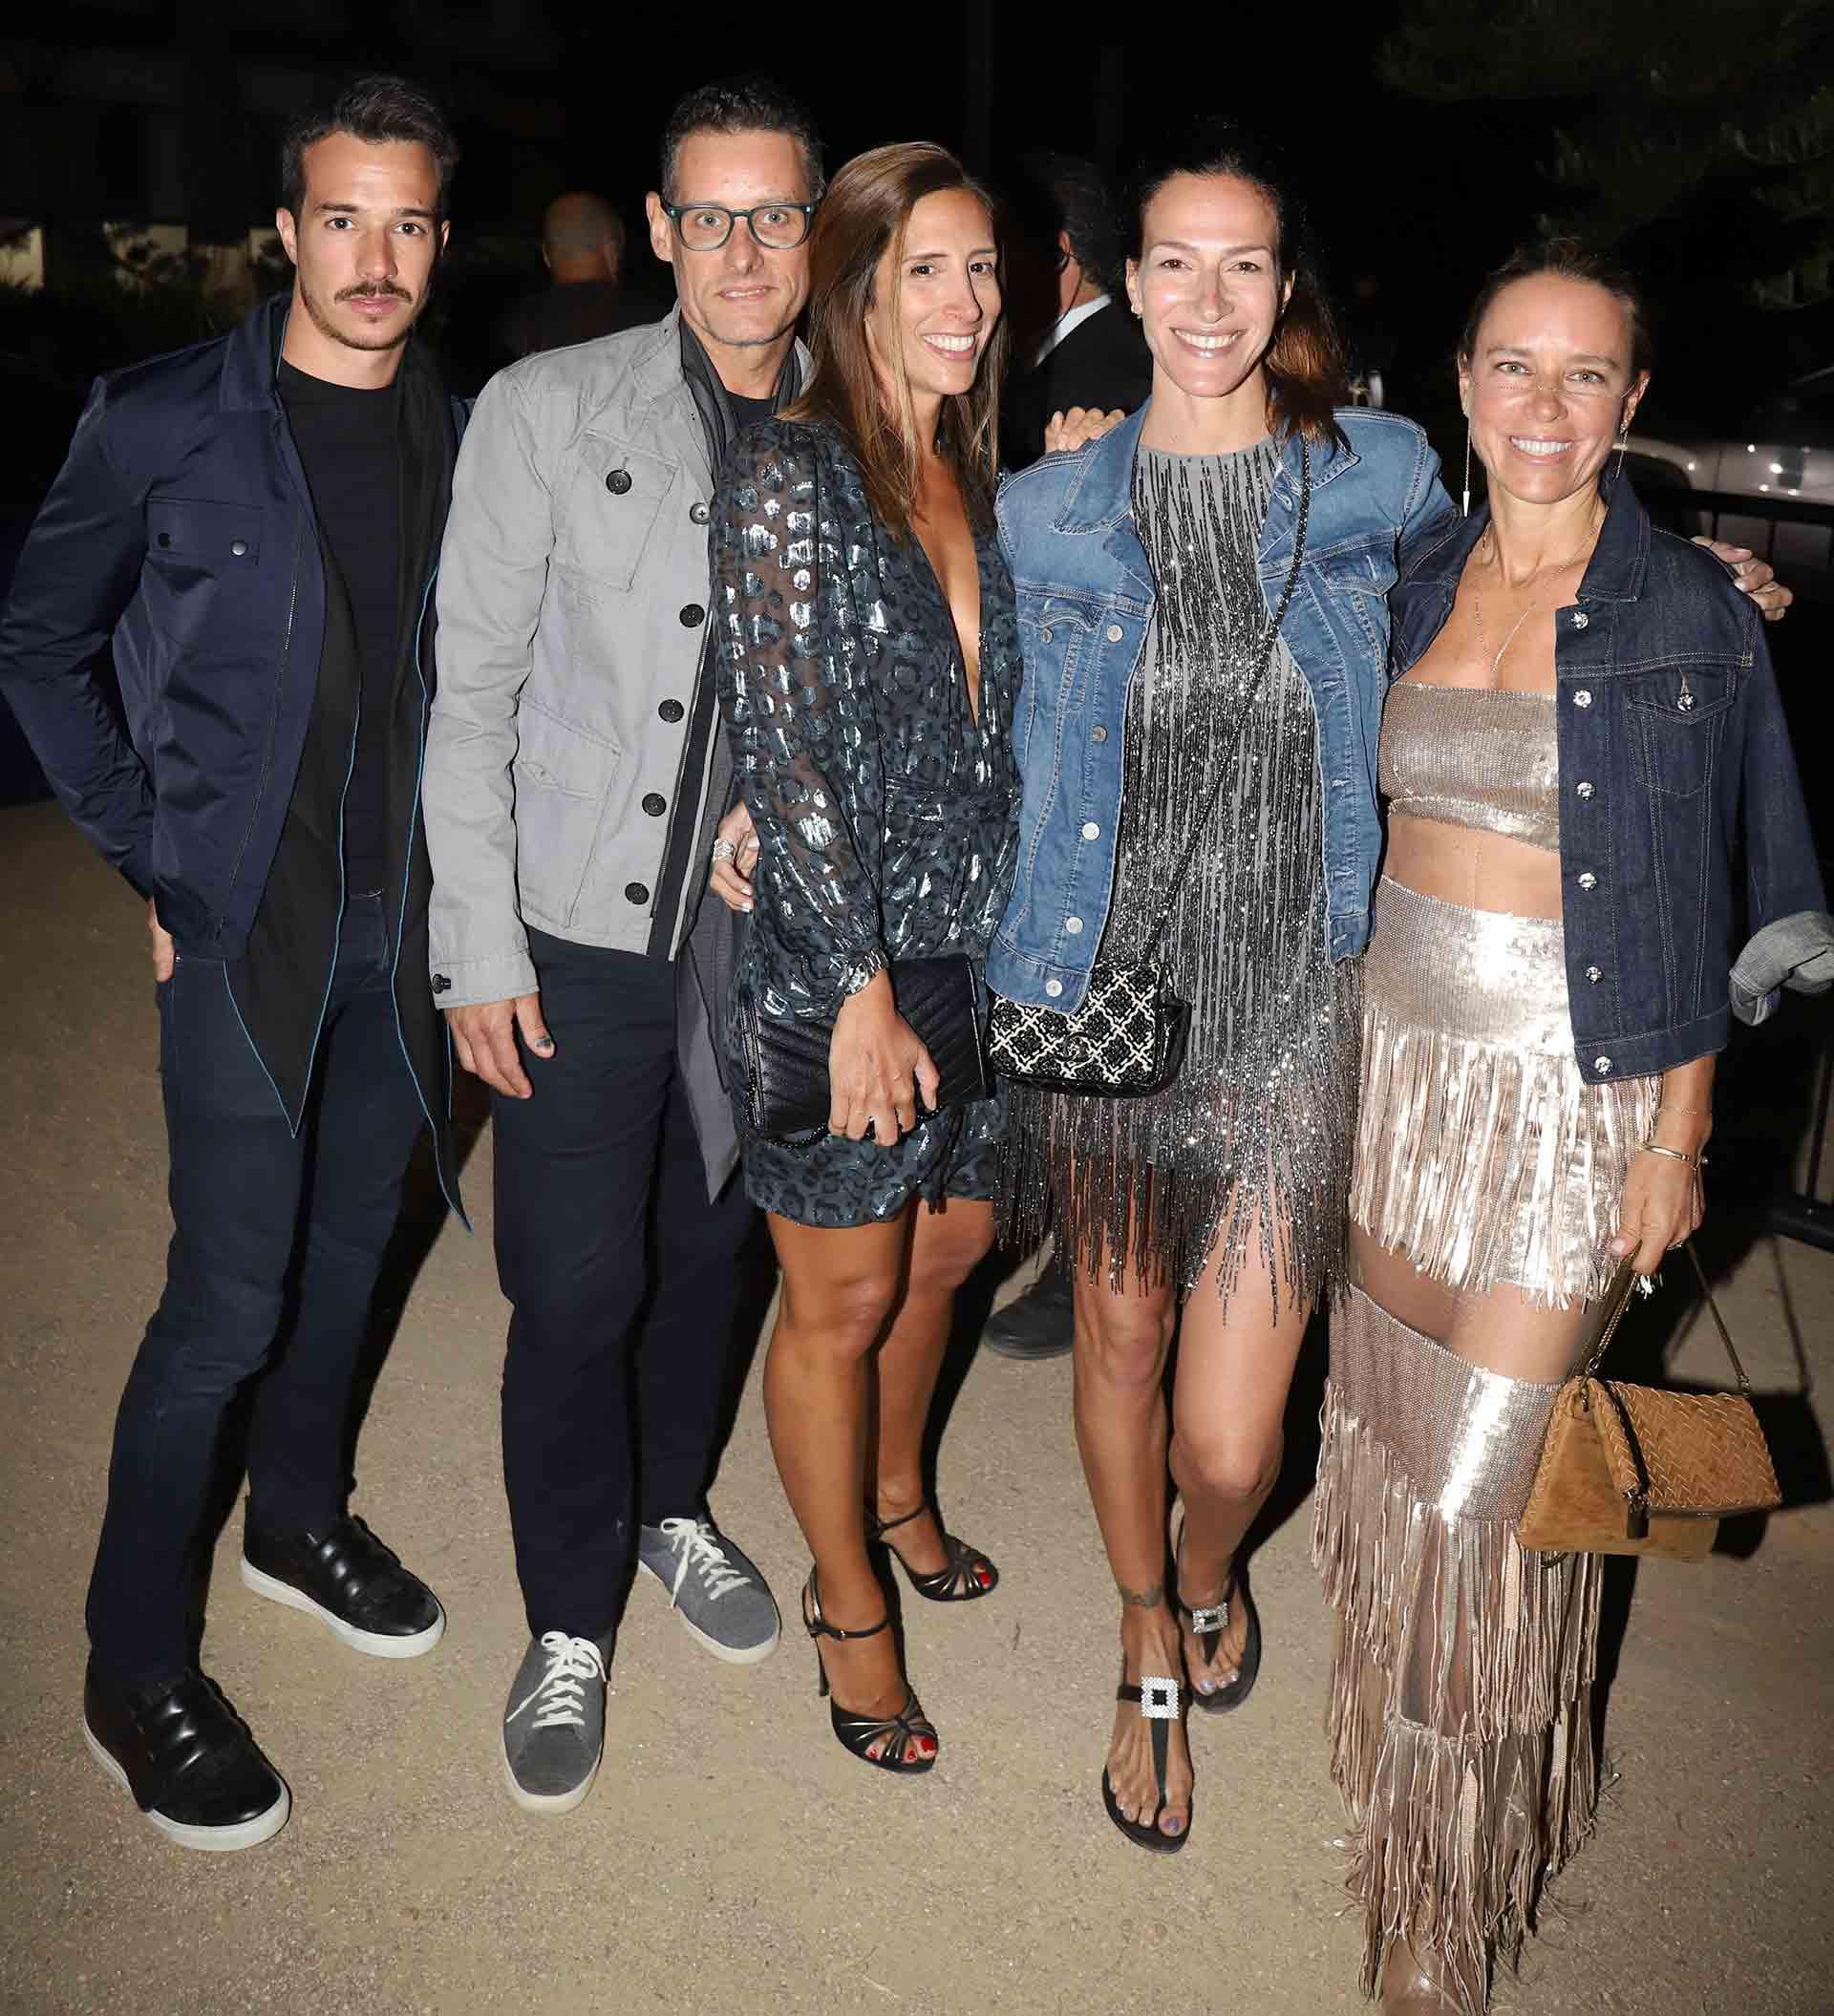 Fabián Bottegal, Florencia Perotti, Dolores Trull y Josie Bridge